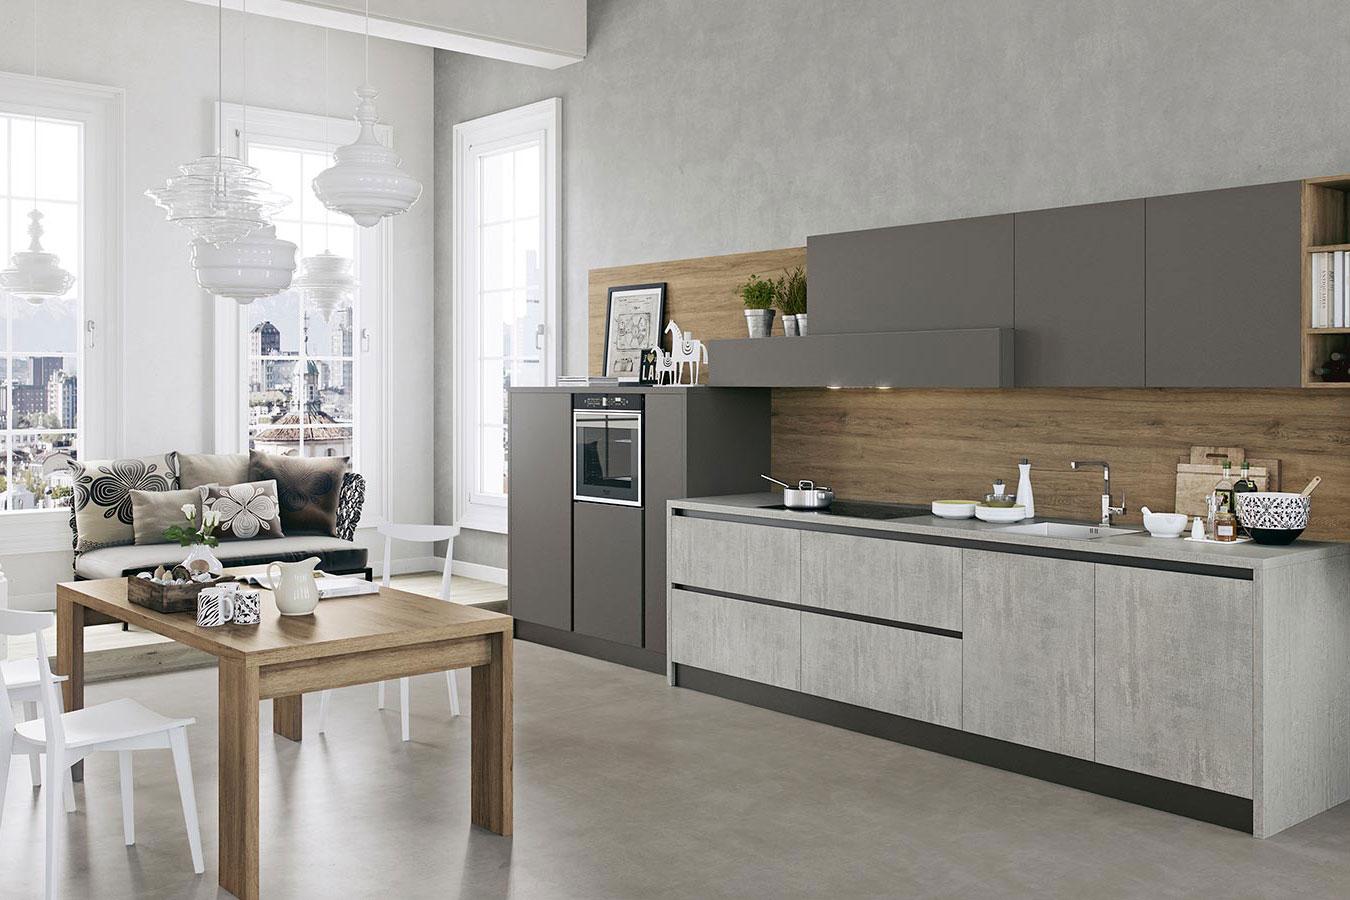 Cucina Kalì di Arredo3 da righetti mobili a Novara Piemonte